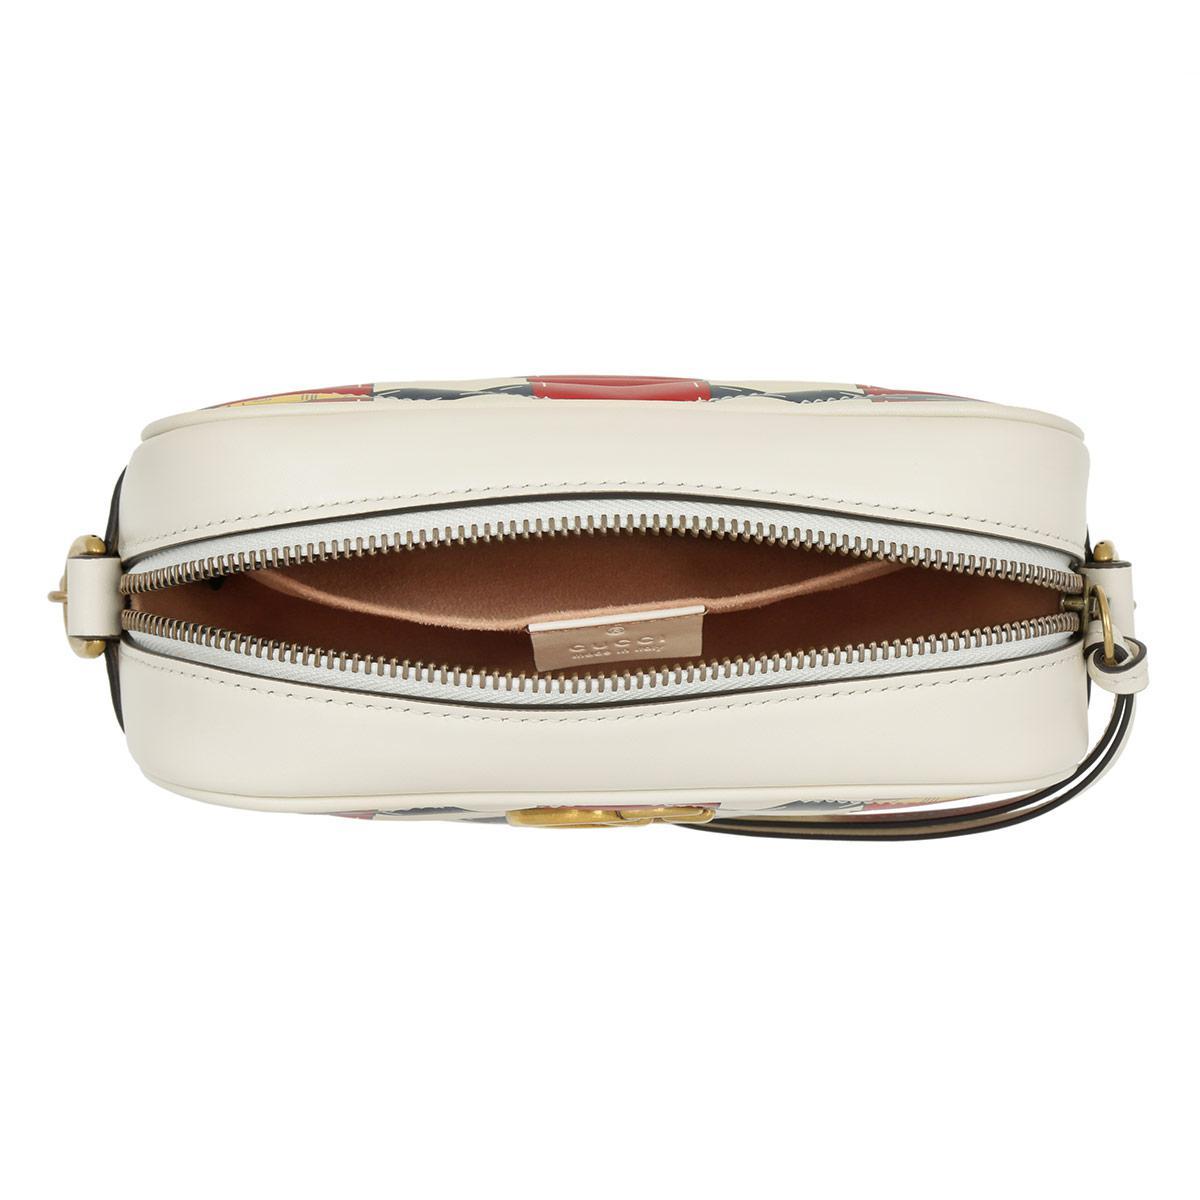 b5a8db05ae3 Gucci Gg Marmont Mini Crossbody Camera Bag Trompe-l oeil-print White ...